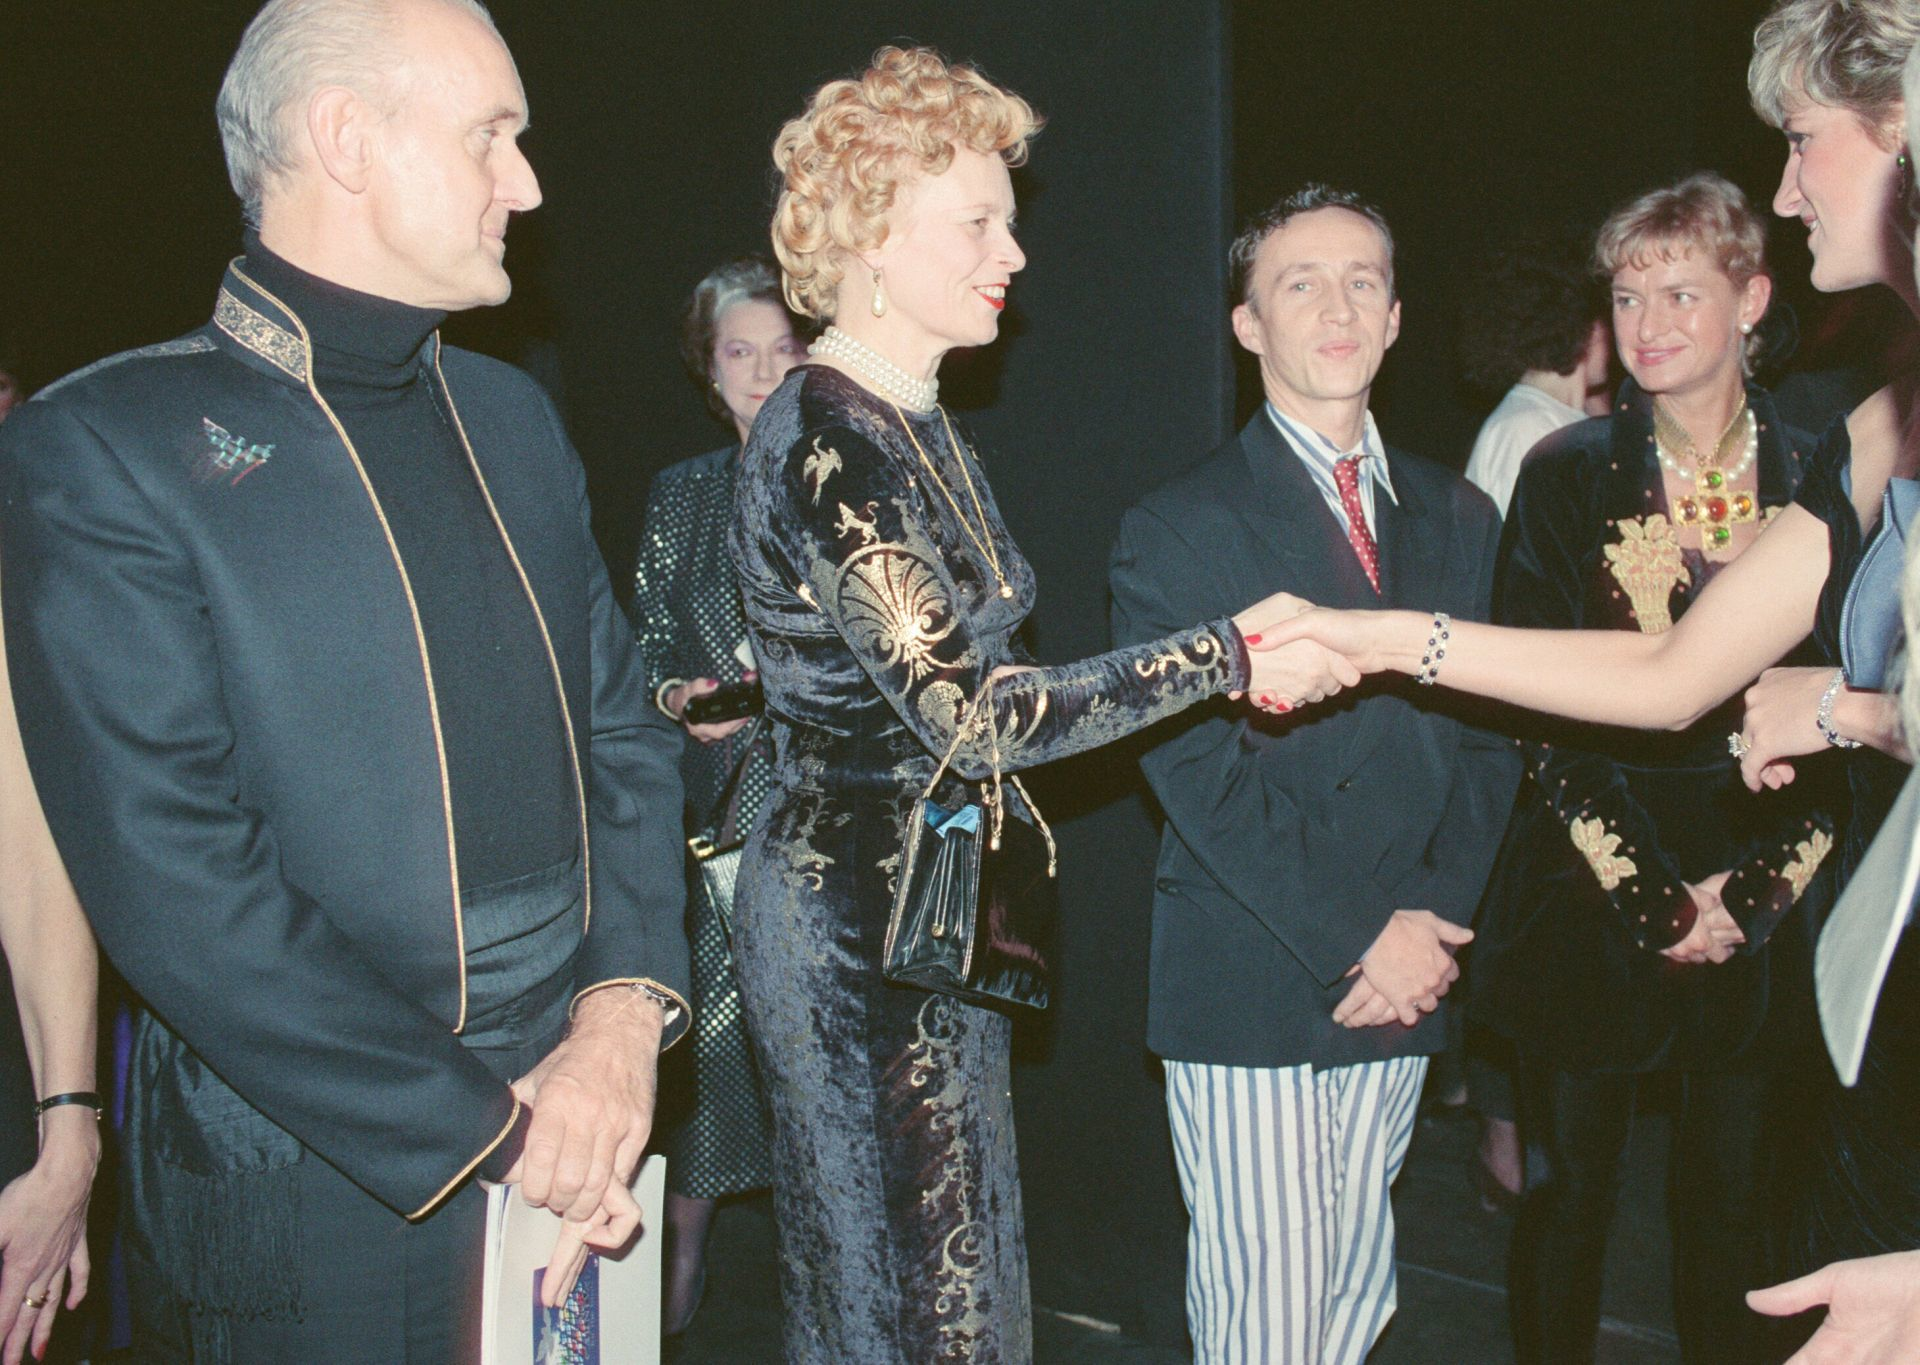 Diana hercegnő és Vivienne Westwood 1991-ben.